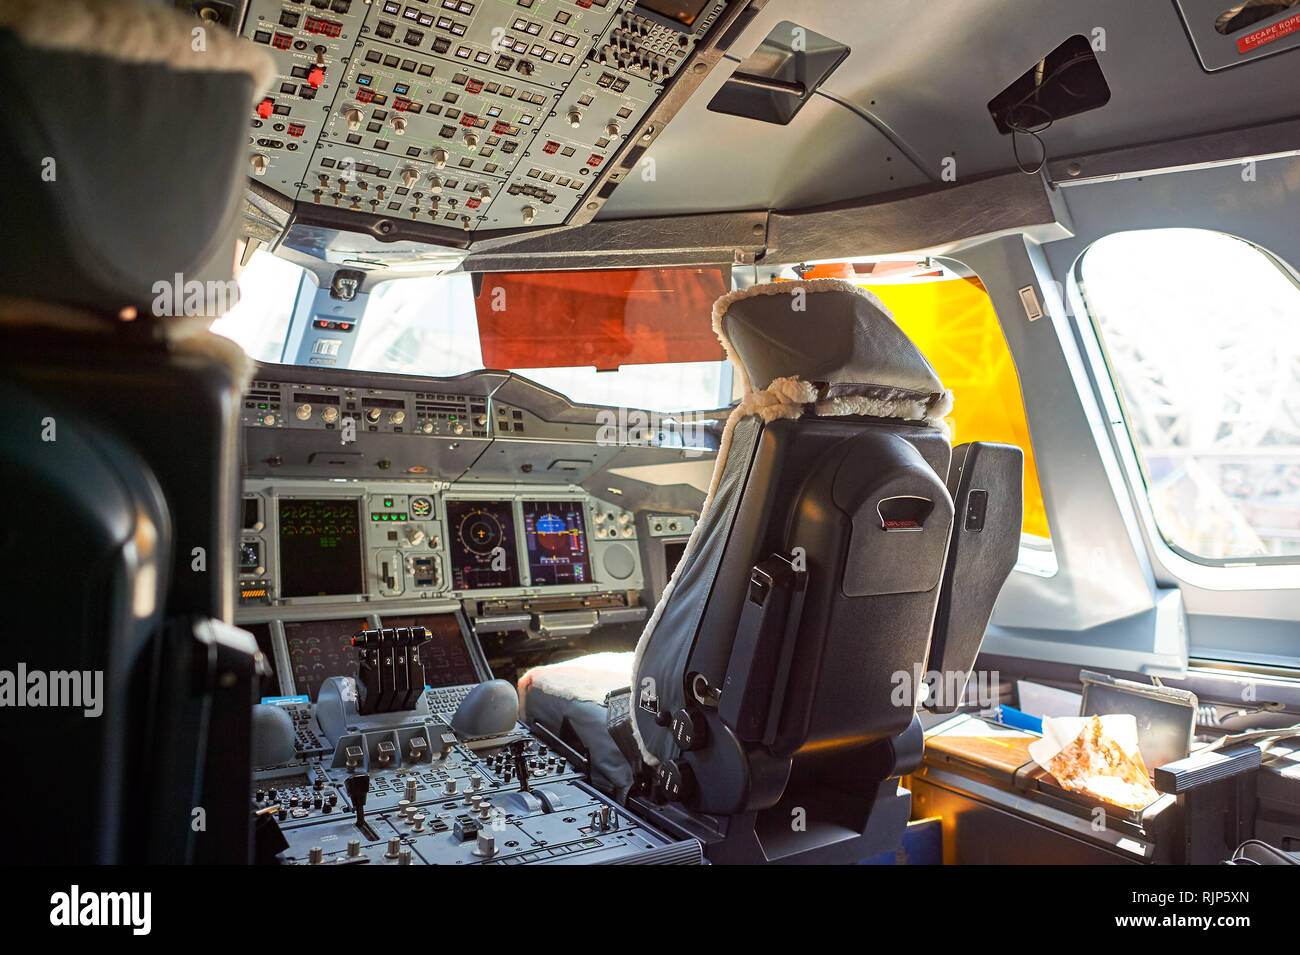 Bangkok Thailand March 31 2015 Interior Of Emirates Airbus A380